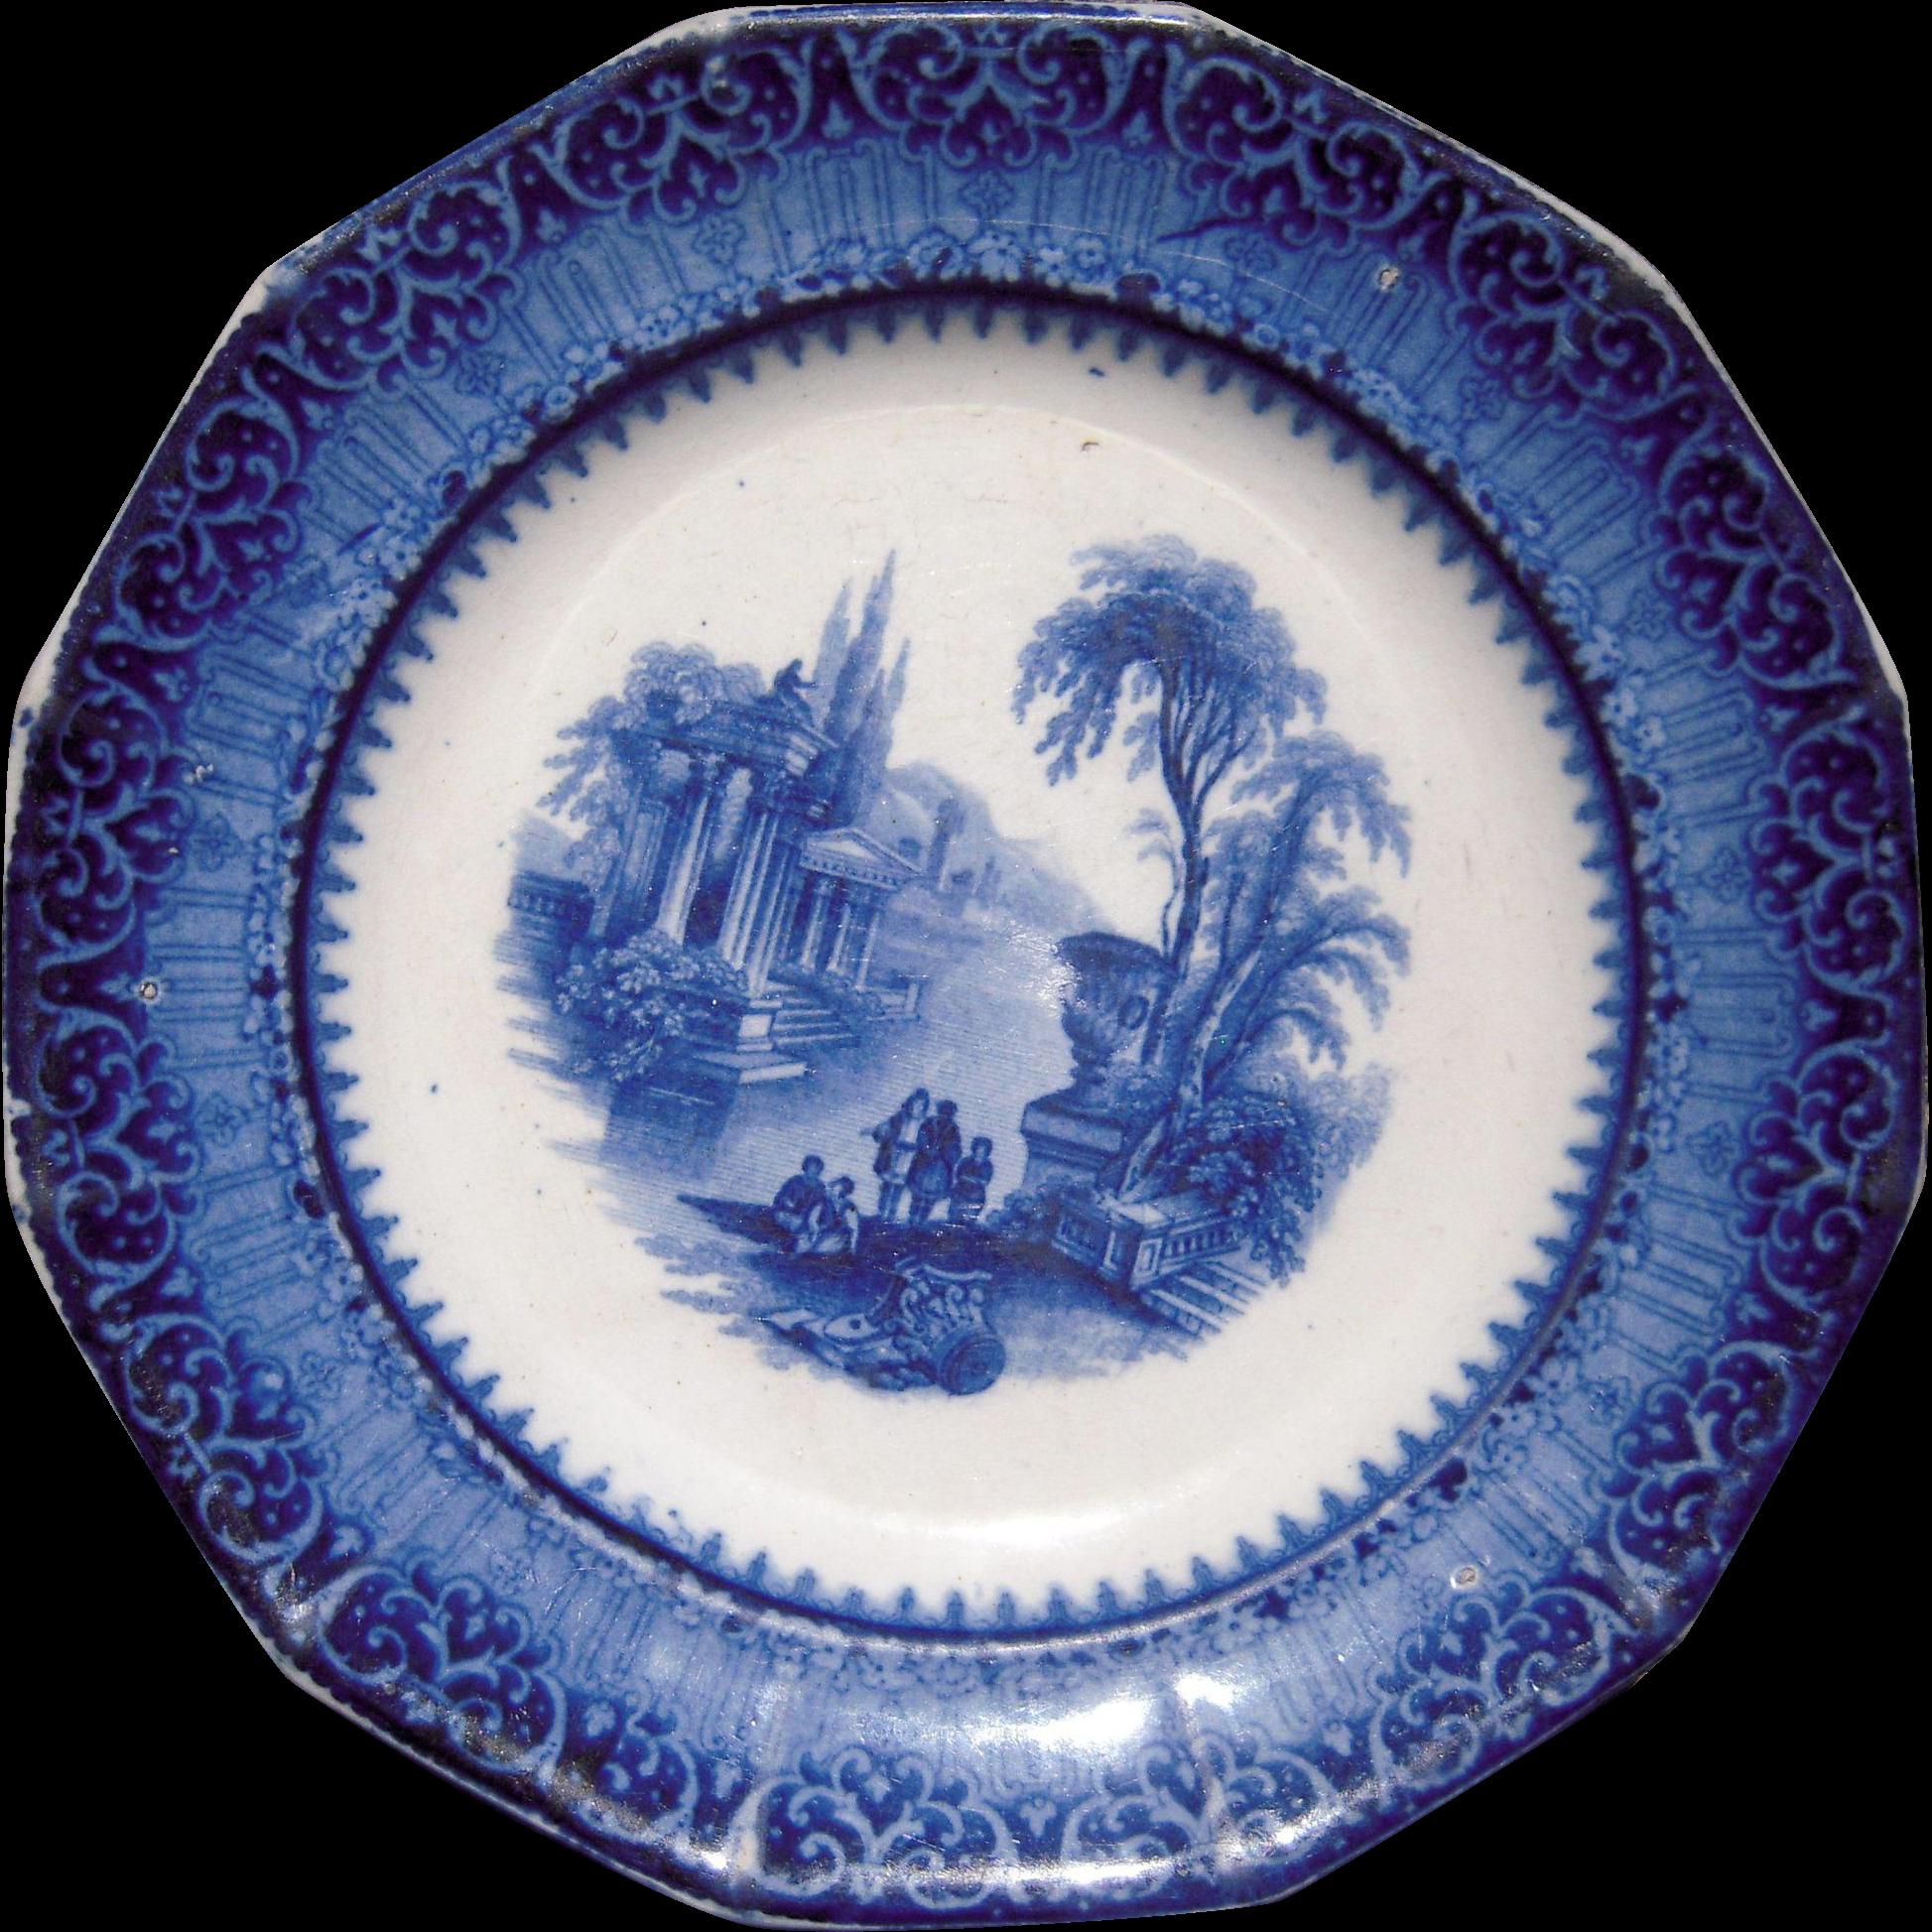 Flow blue plate quot temple from bluesprucerugsandantiques